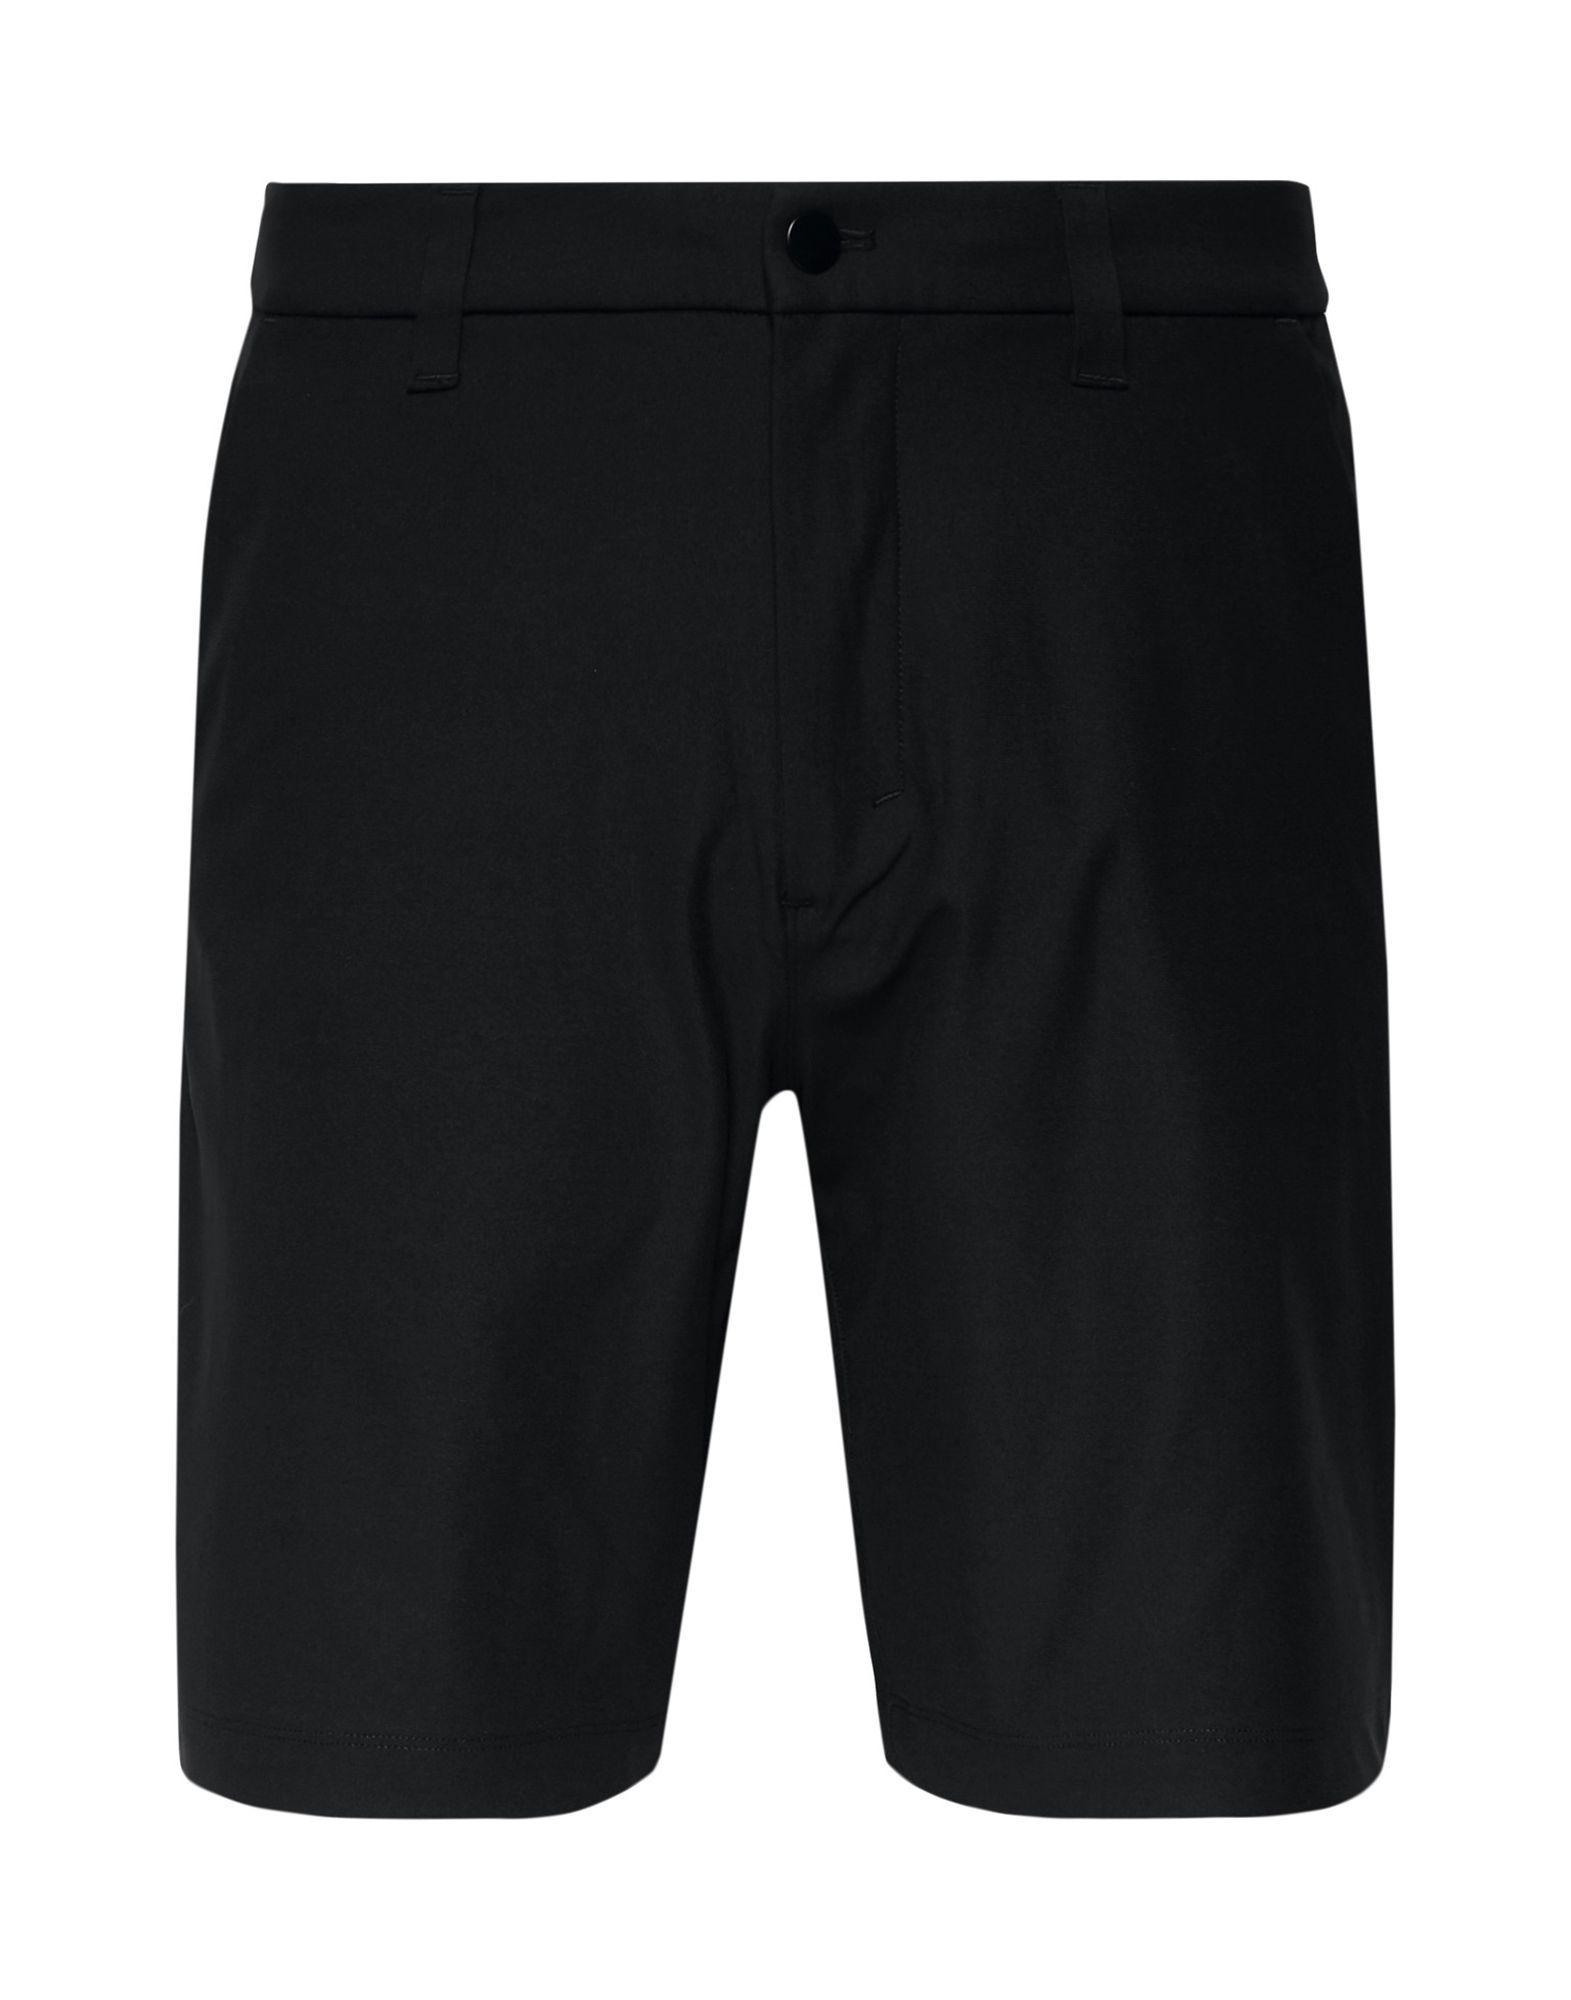 LULULEMON Bermudas. jersey, no appliqués, mid rise, regular fit, basic solid color, button, zip, multipockets. 100% Polyester